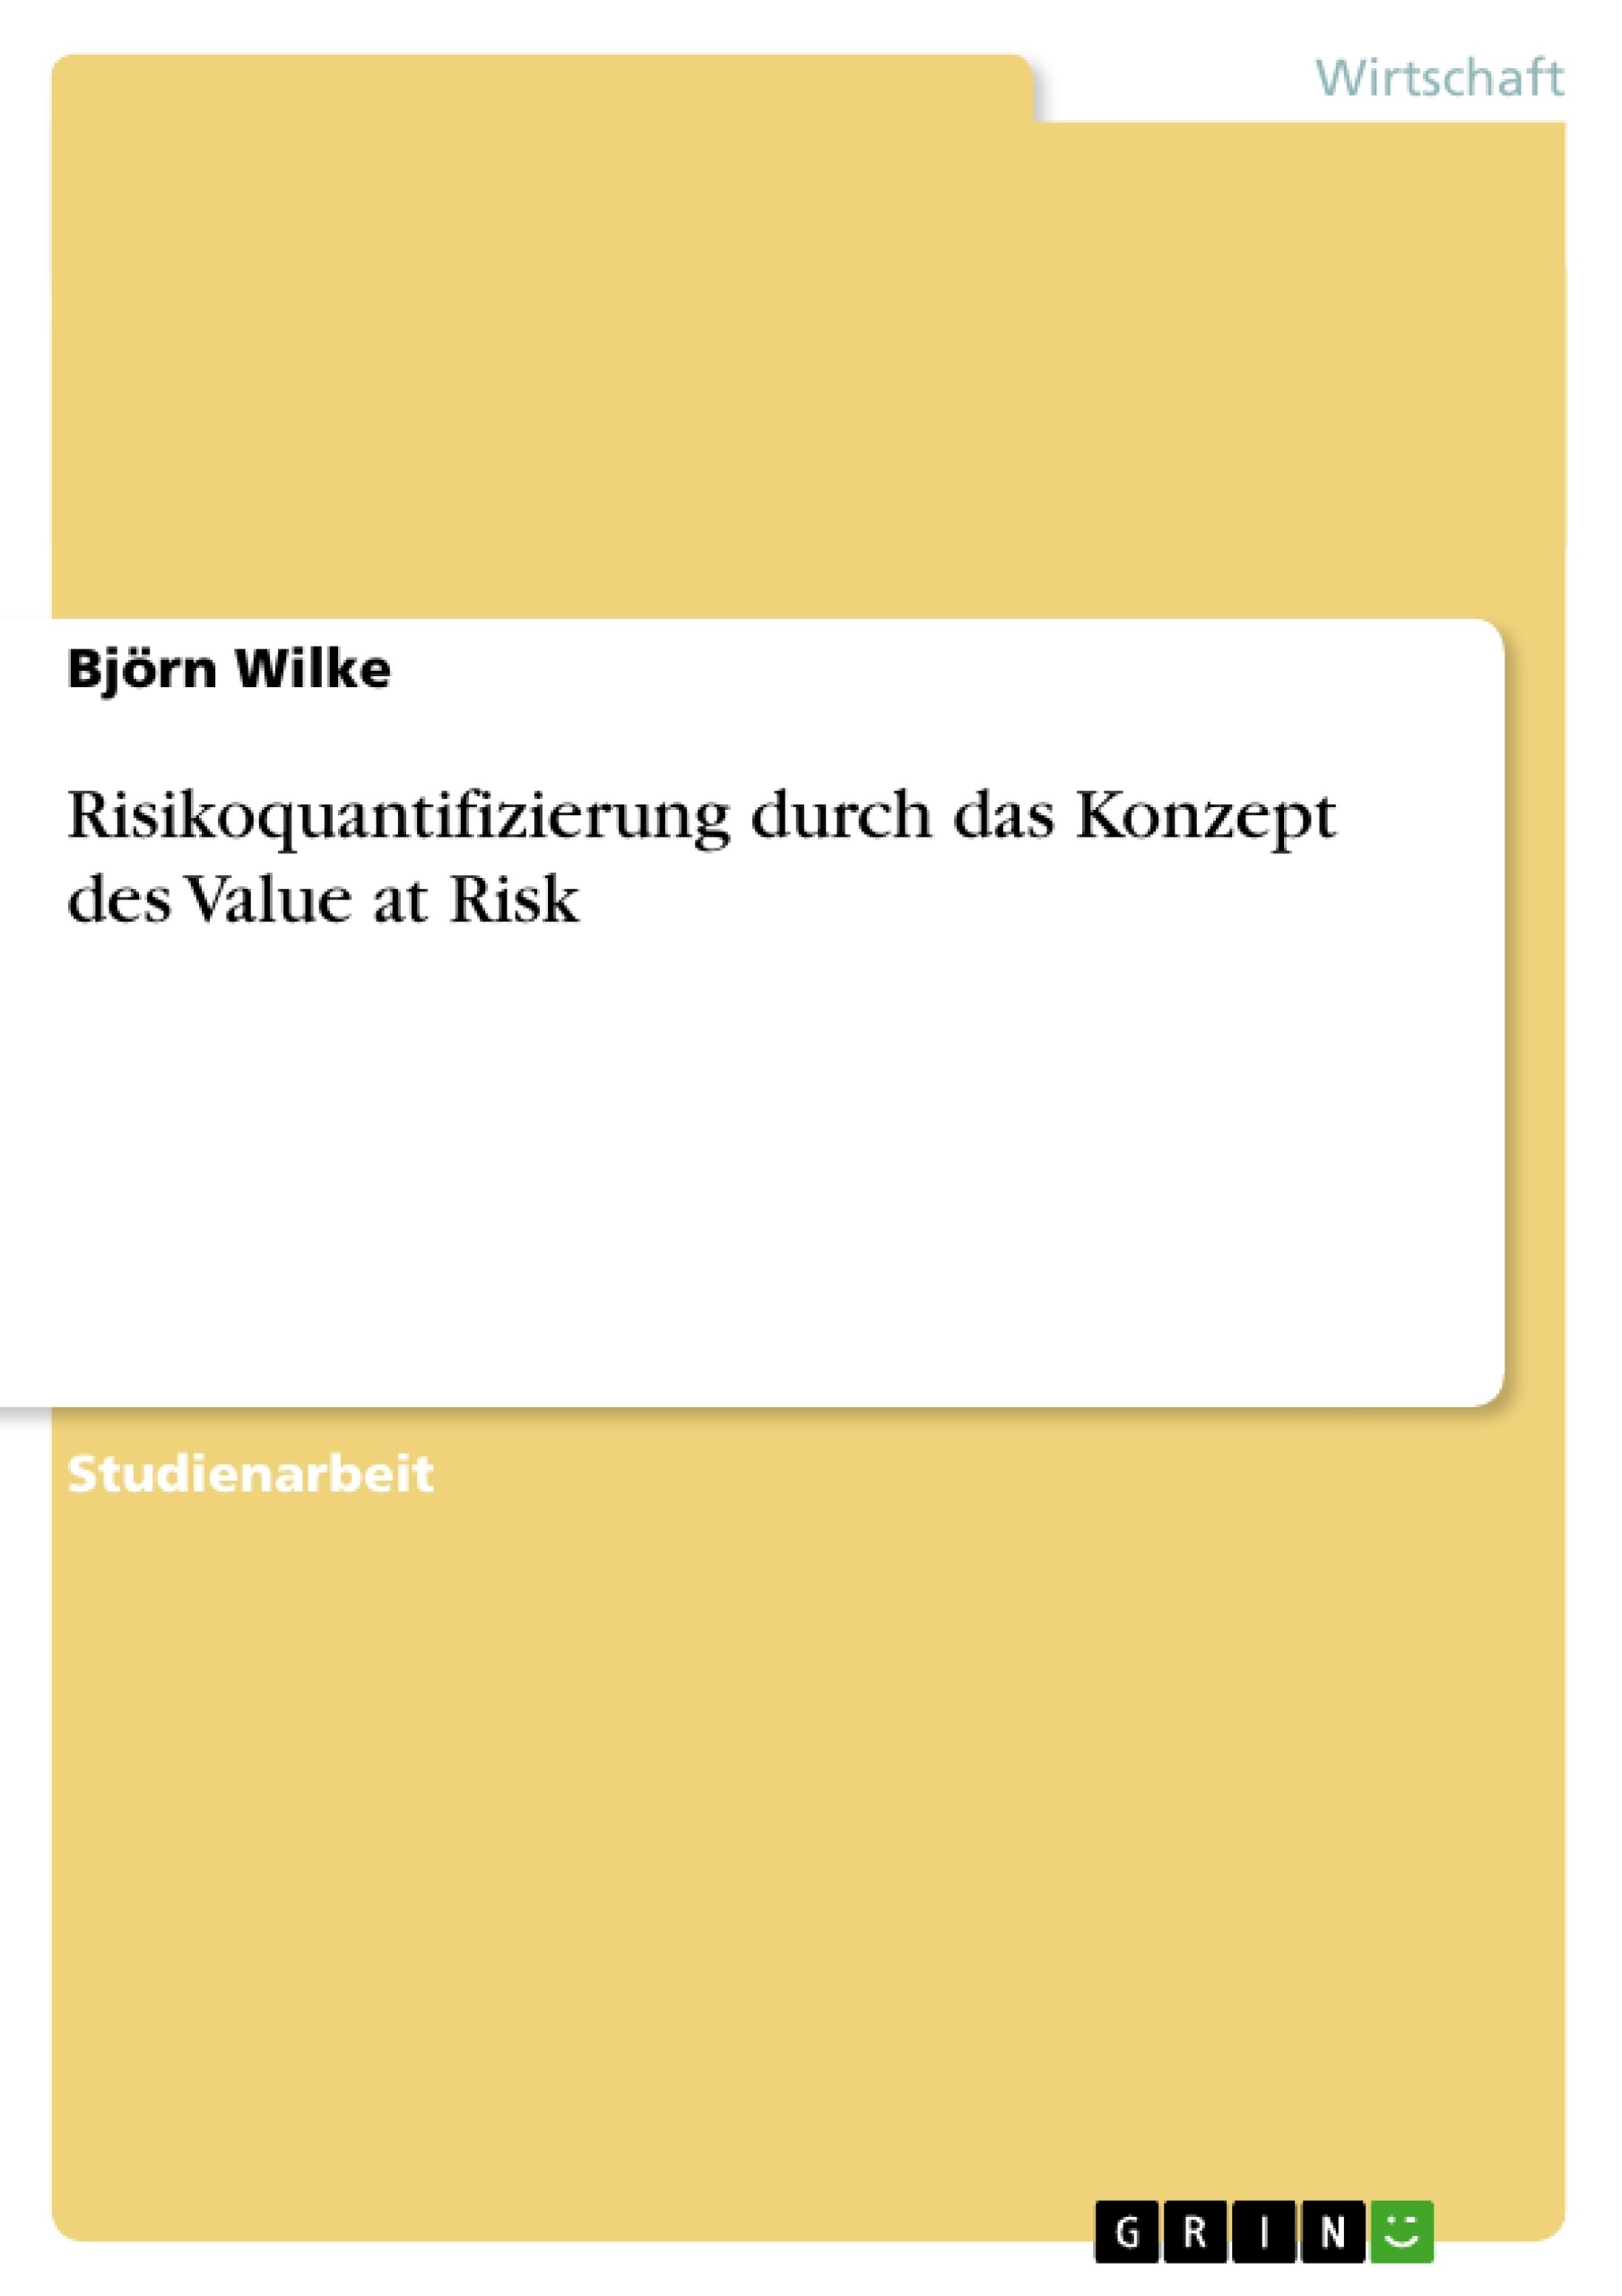 Titel: Risikoquantifizierung durch das Konzept des Value at Risk